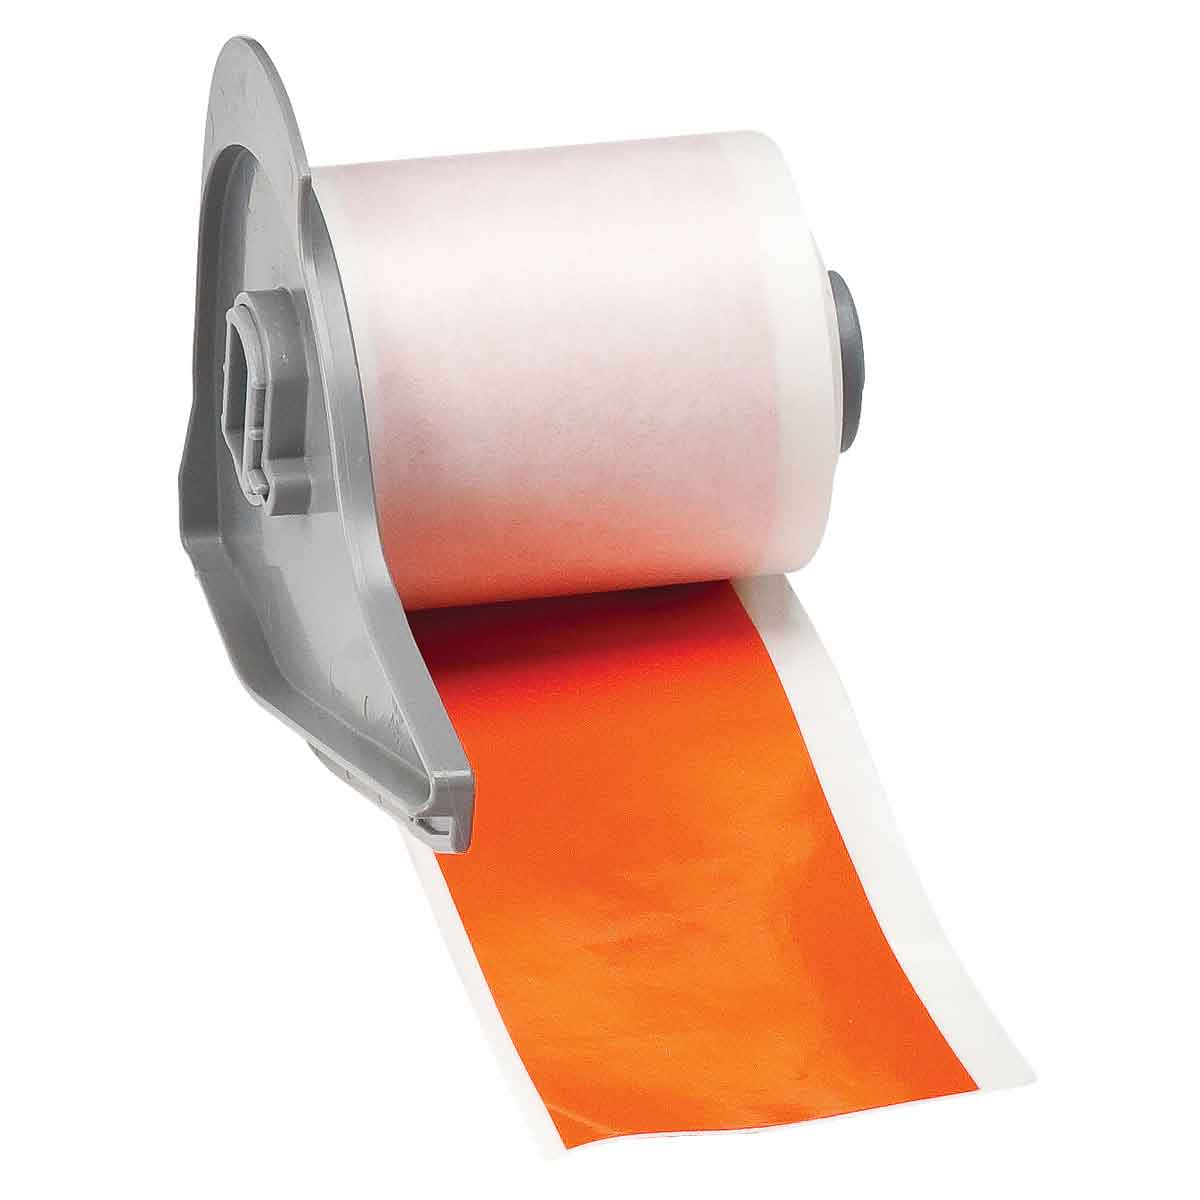 Brady® M71C-2000-595-OR Blank Thermal Transfer Tape, 50 ft L x 2 in W, Orange, B-595 Vinyl, Permanent Acrylic Adhesive, -40 to 180 deg F